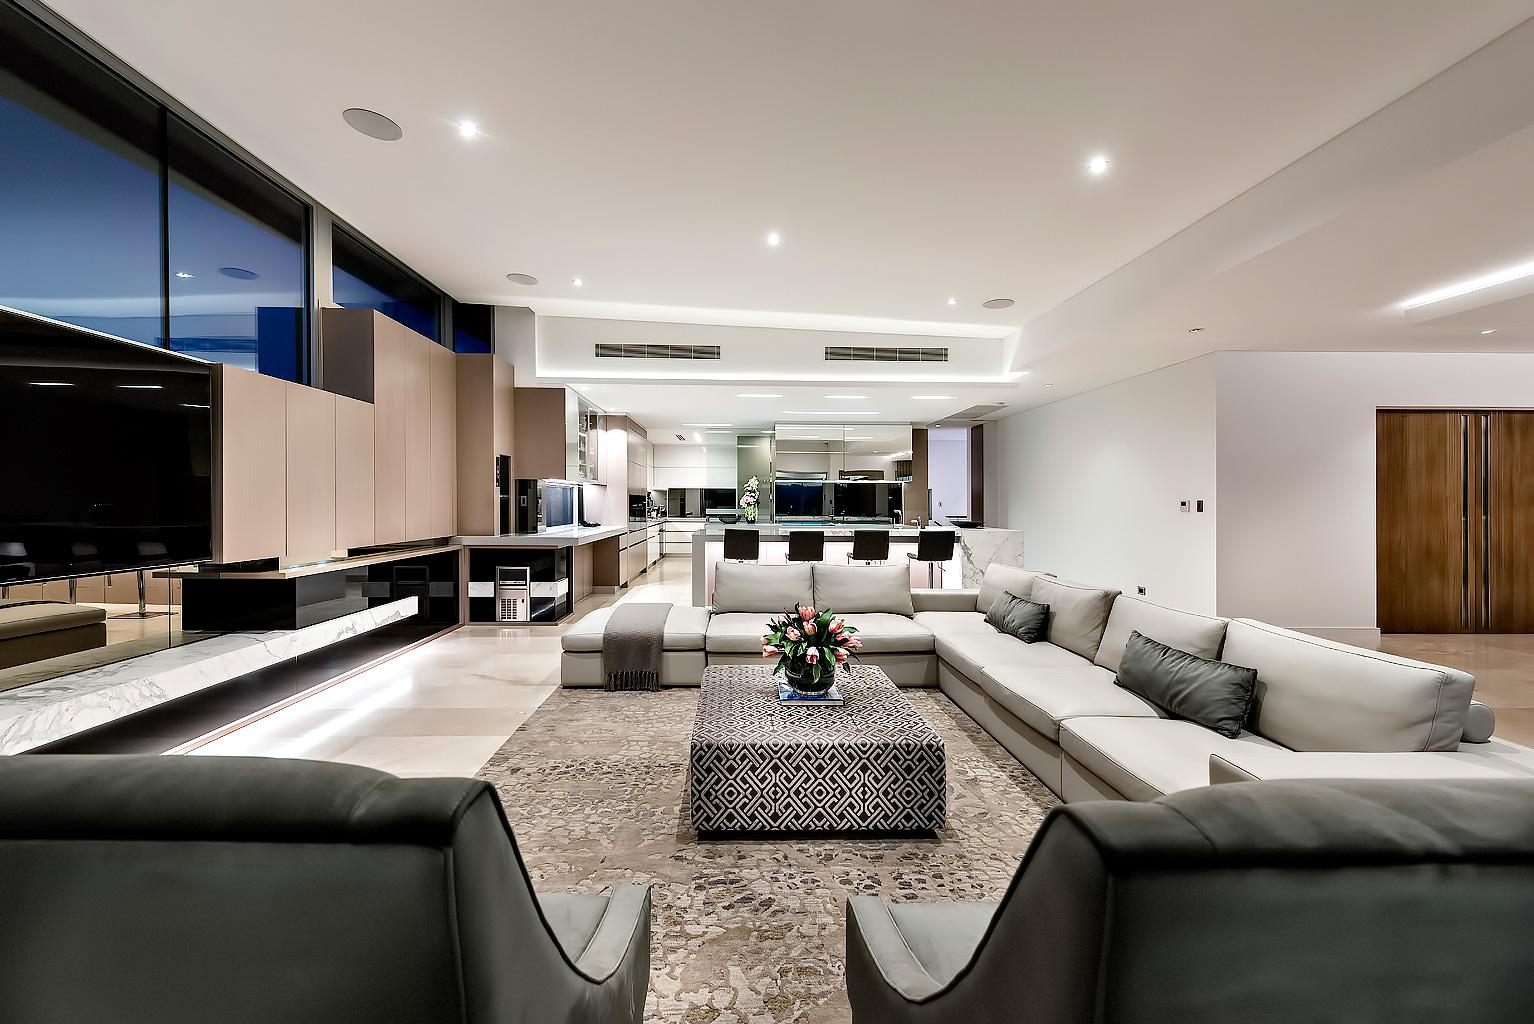 12 – Perth Luxury Residence – Seaward Loop, Sorrento, WA, Australia